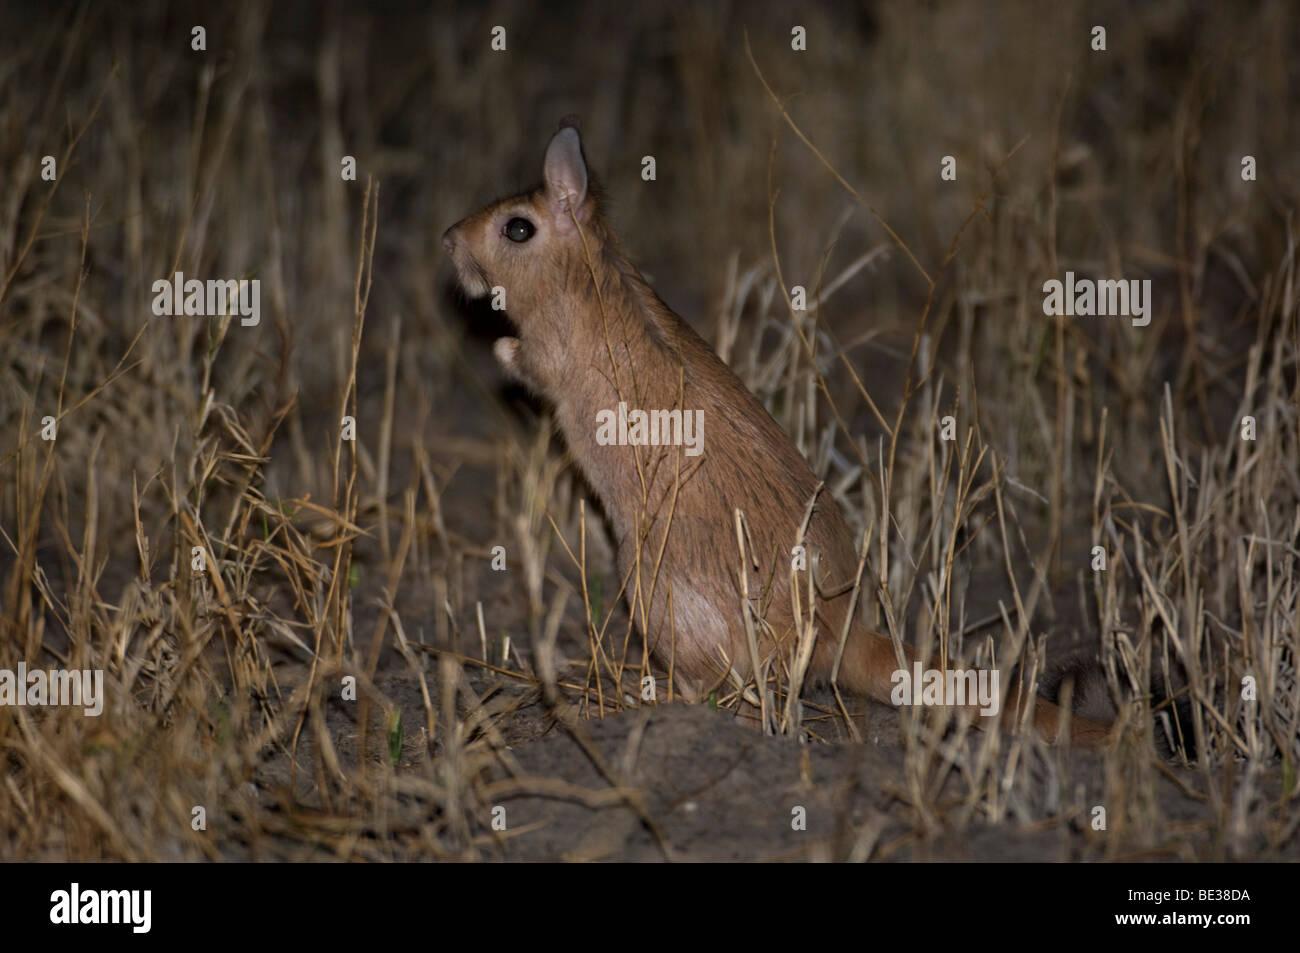 Springhare (Pedetes capensis), Central Kalahari, Botswana - Stock Image